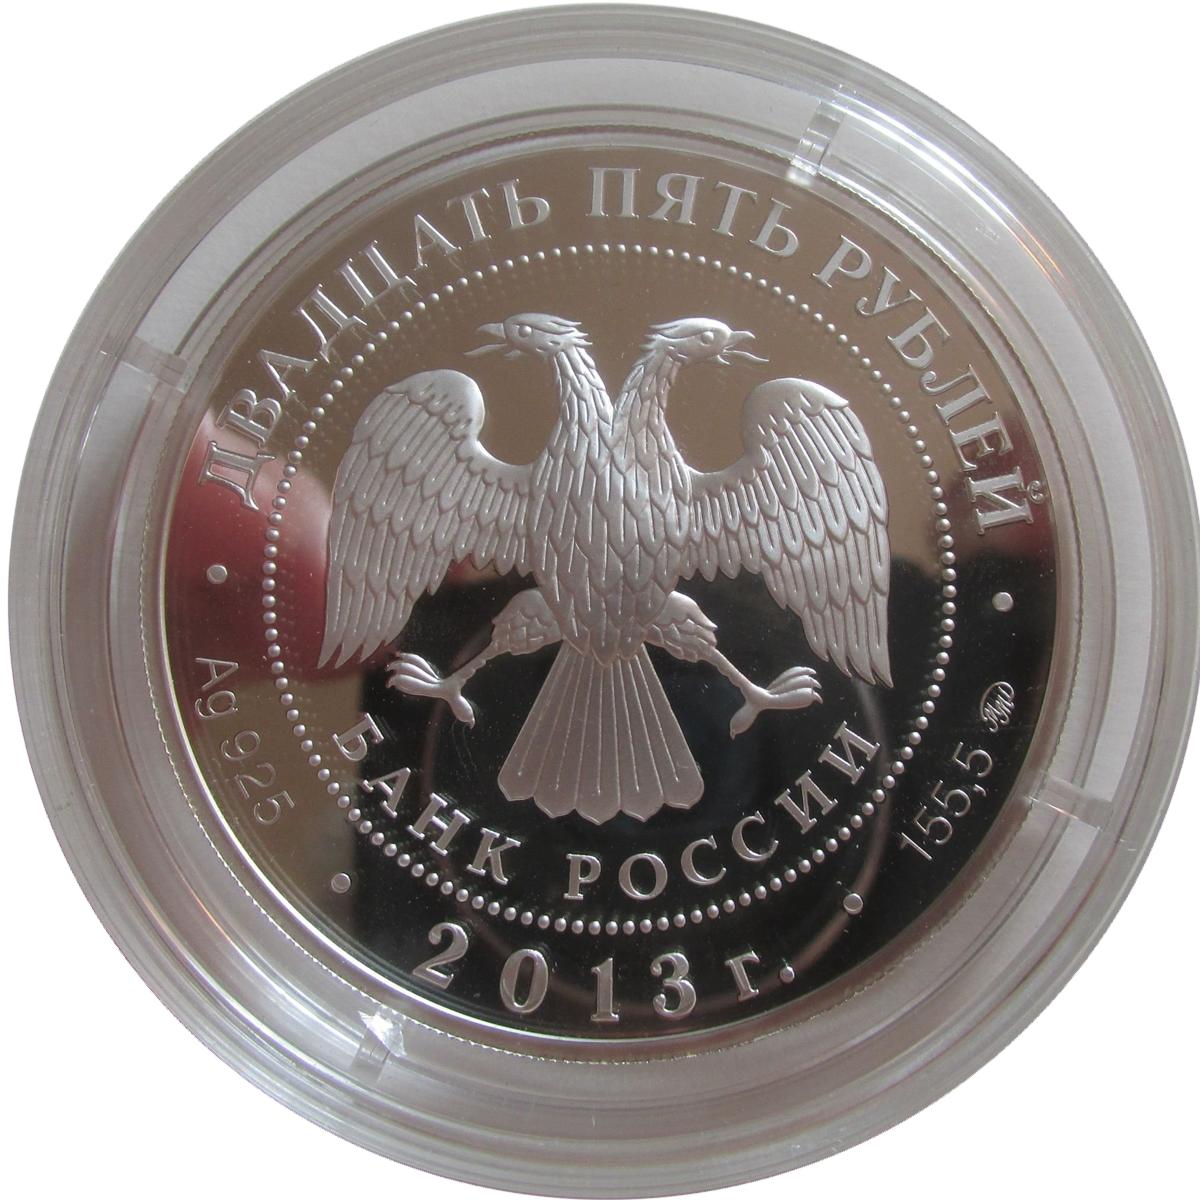 25 рублей 2013 ММД Генералиссимус Алексей Семёнович Шеин СЕРЕБРО 925 пр 155,5 грамм PROOF